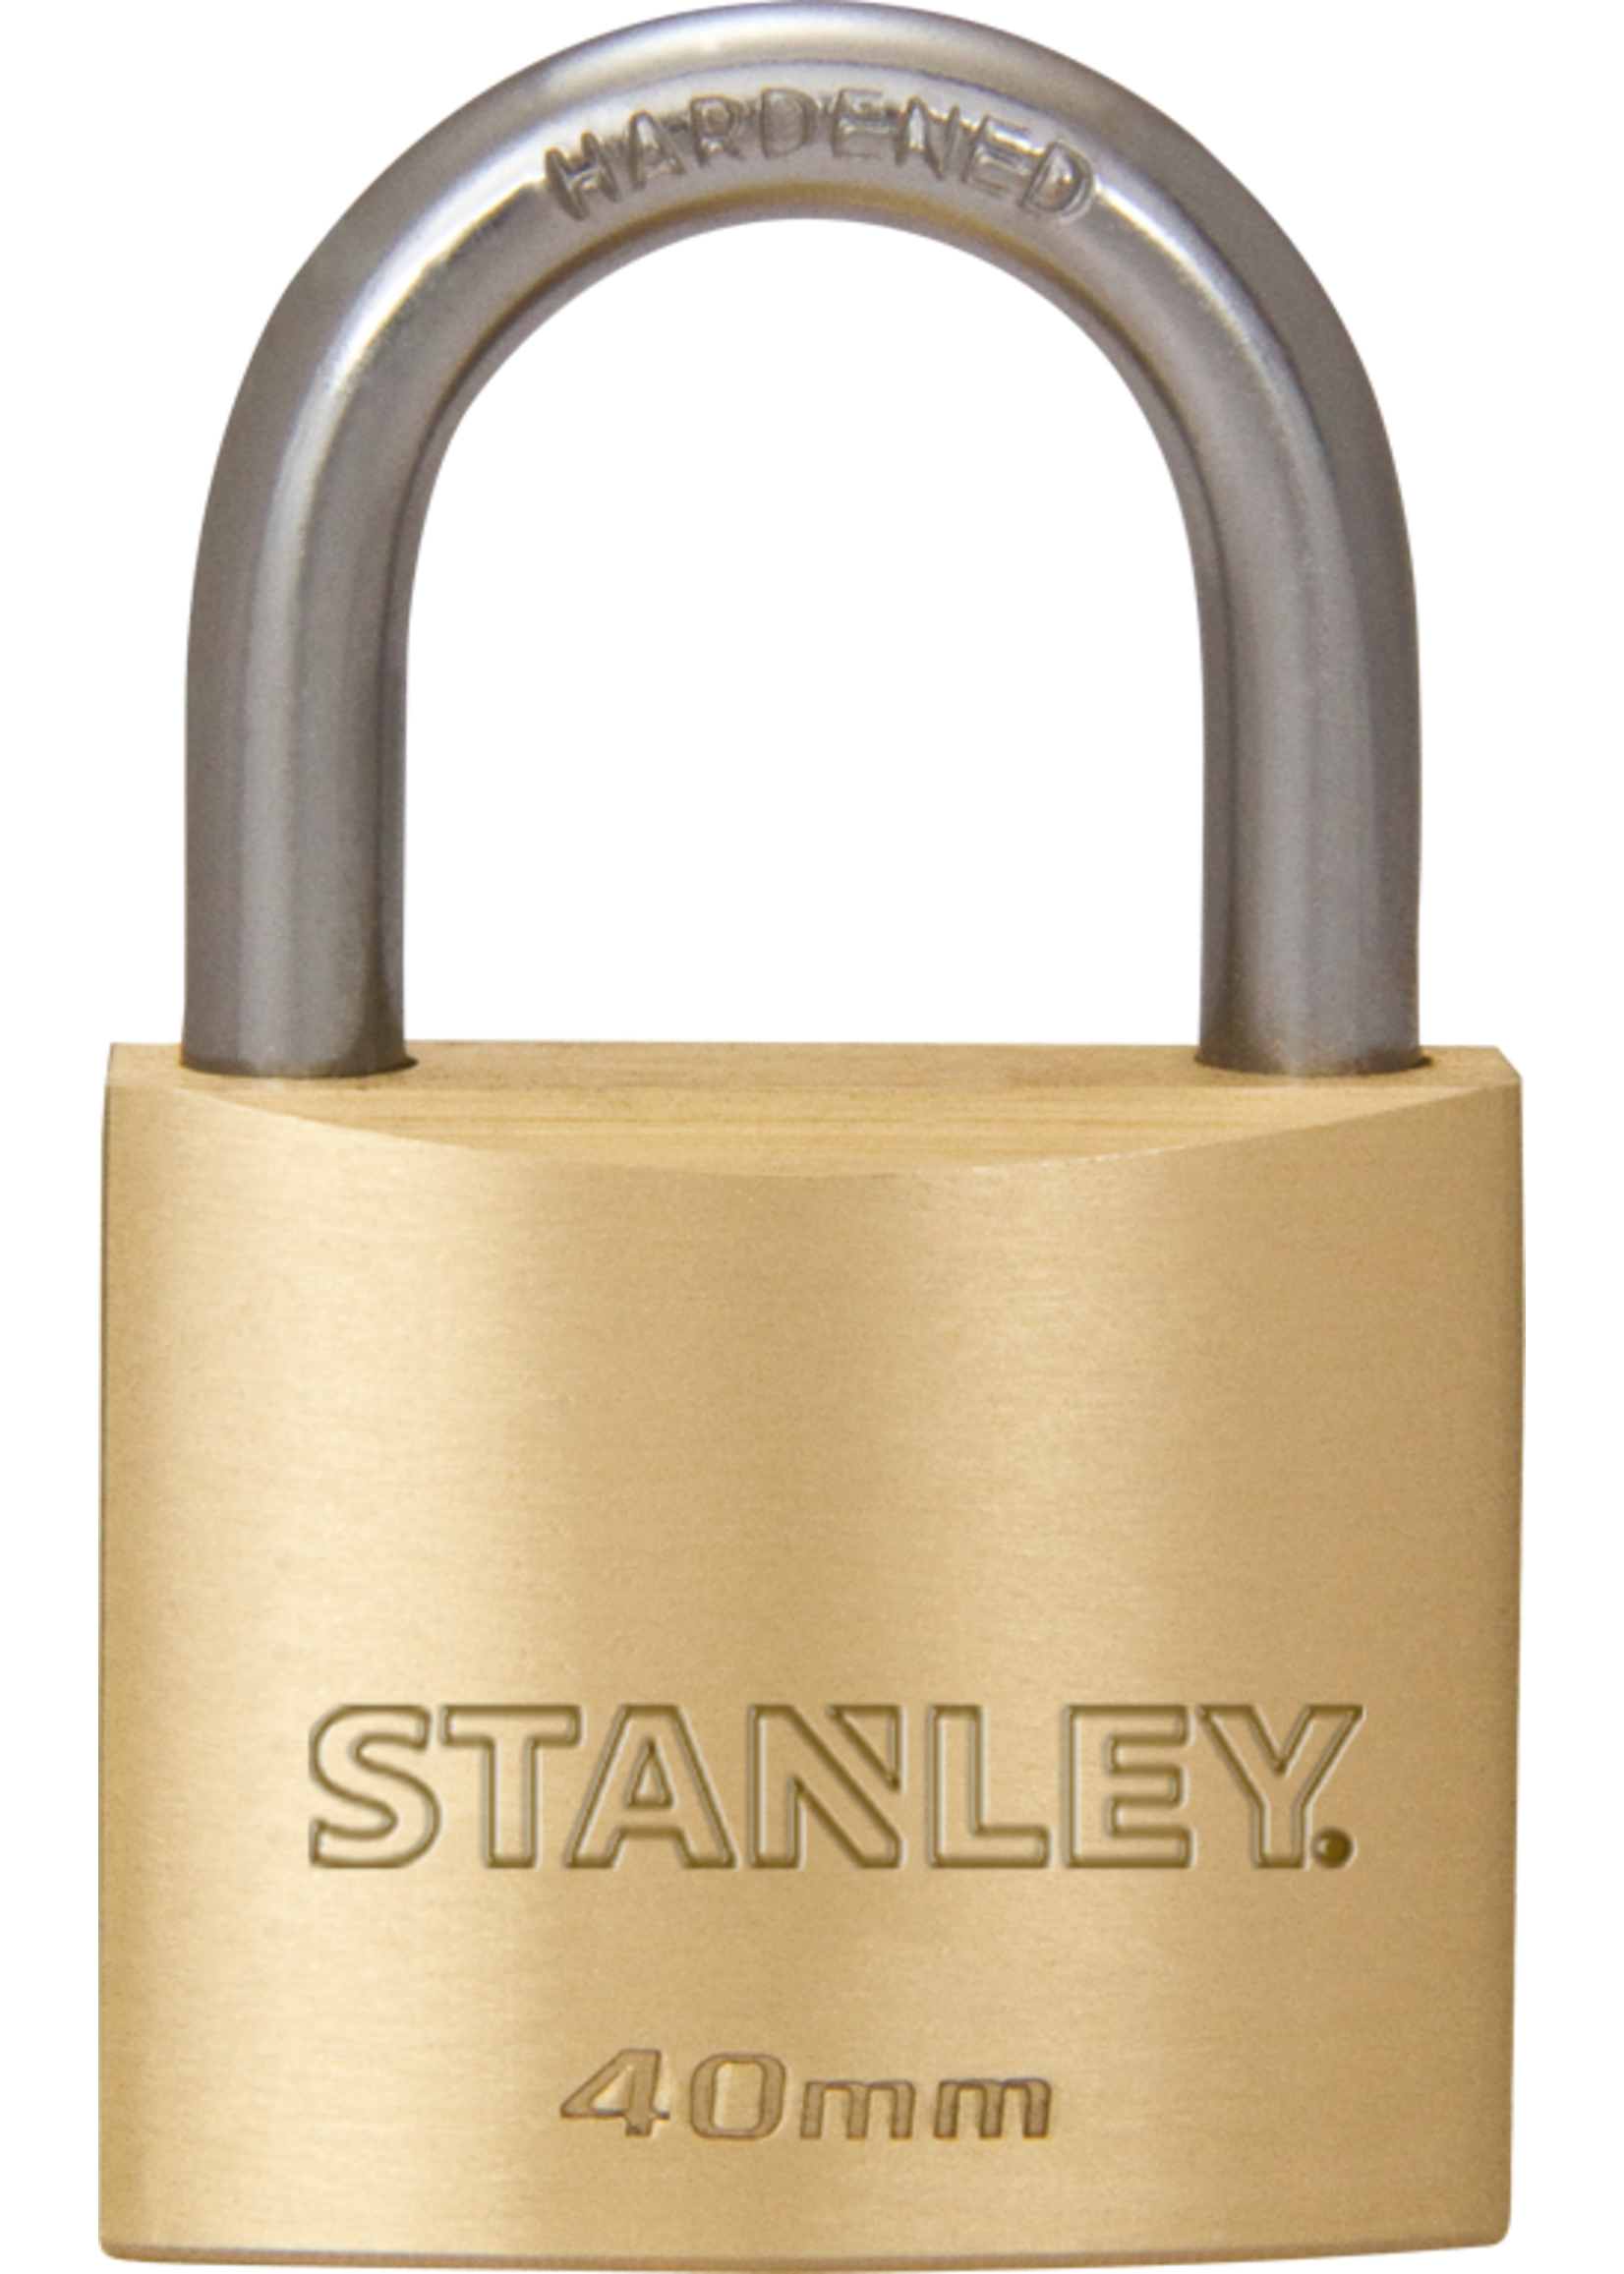 Stanley 2 stuks Stanley hangslot massief messing 40 mm standaard beugel